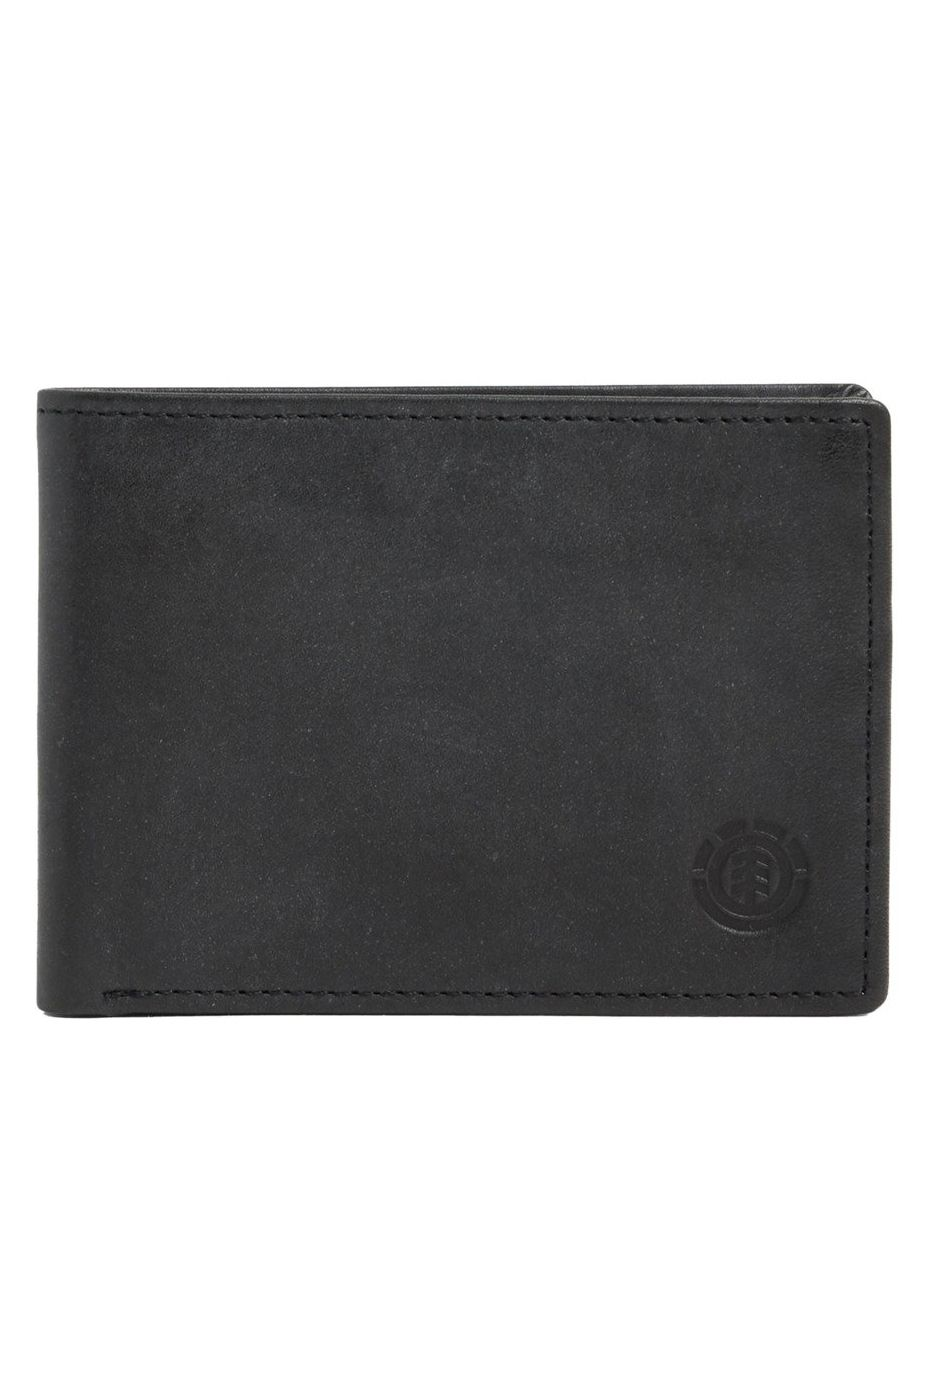 Element Leather Wallet AVENUE WALLET Black